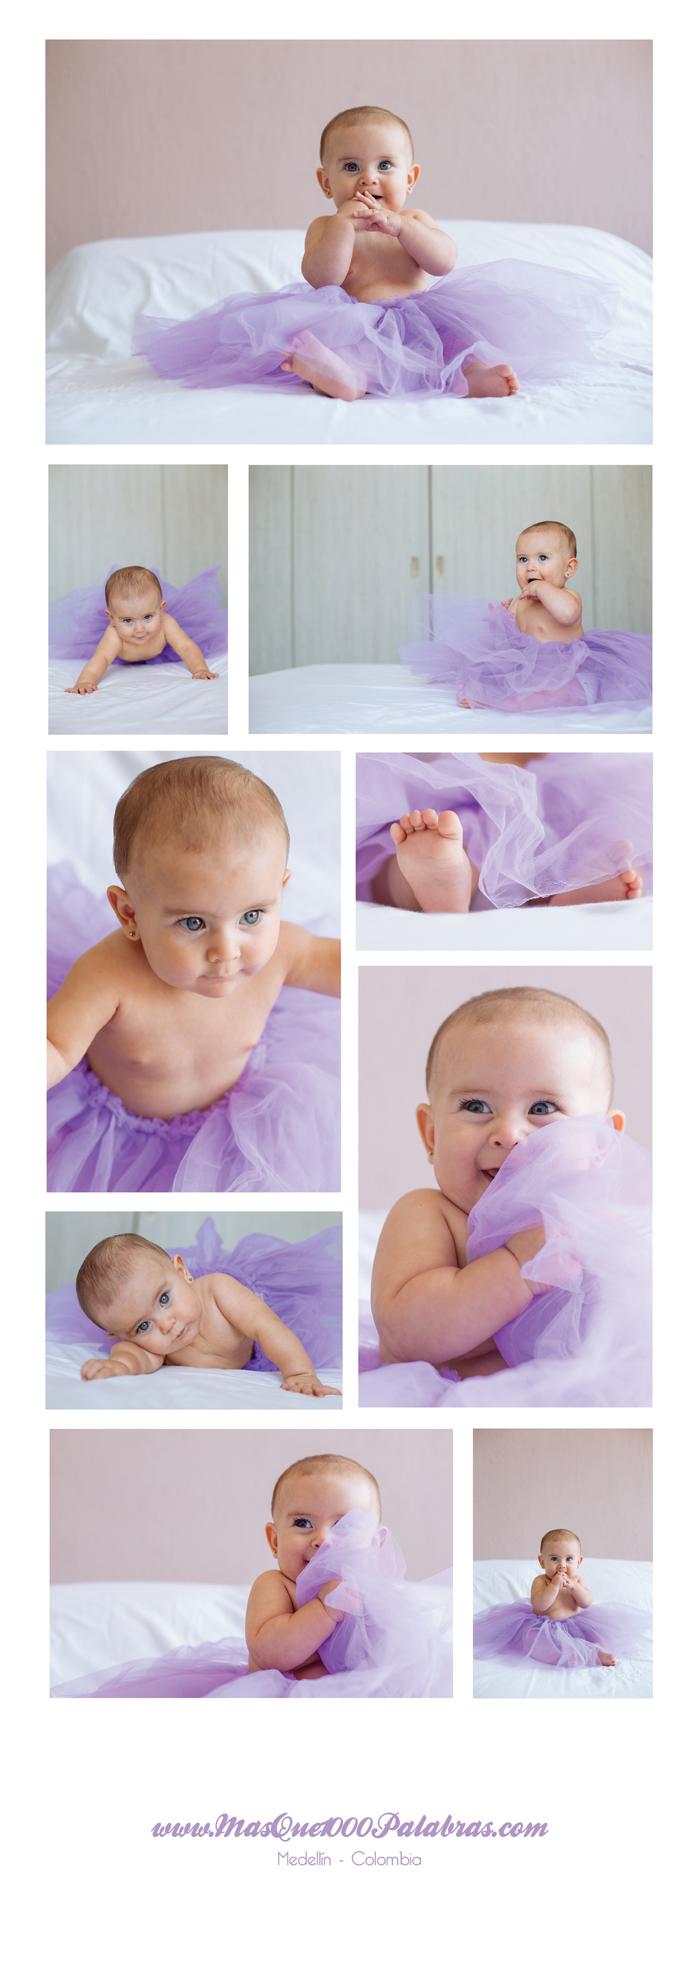 fotografia, bebe, medellin, masque1000palabras, estudio, infantil